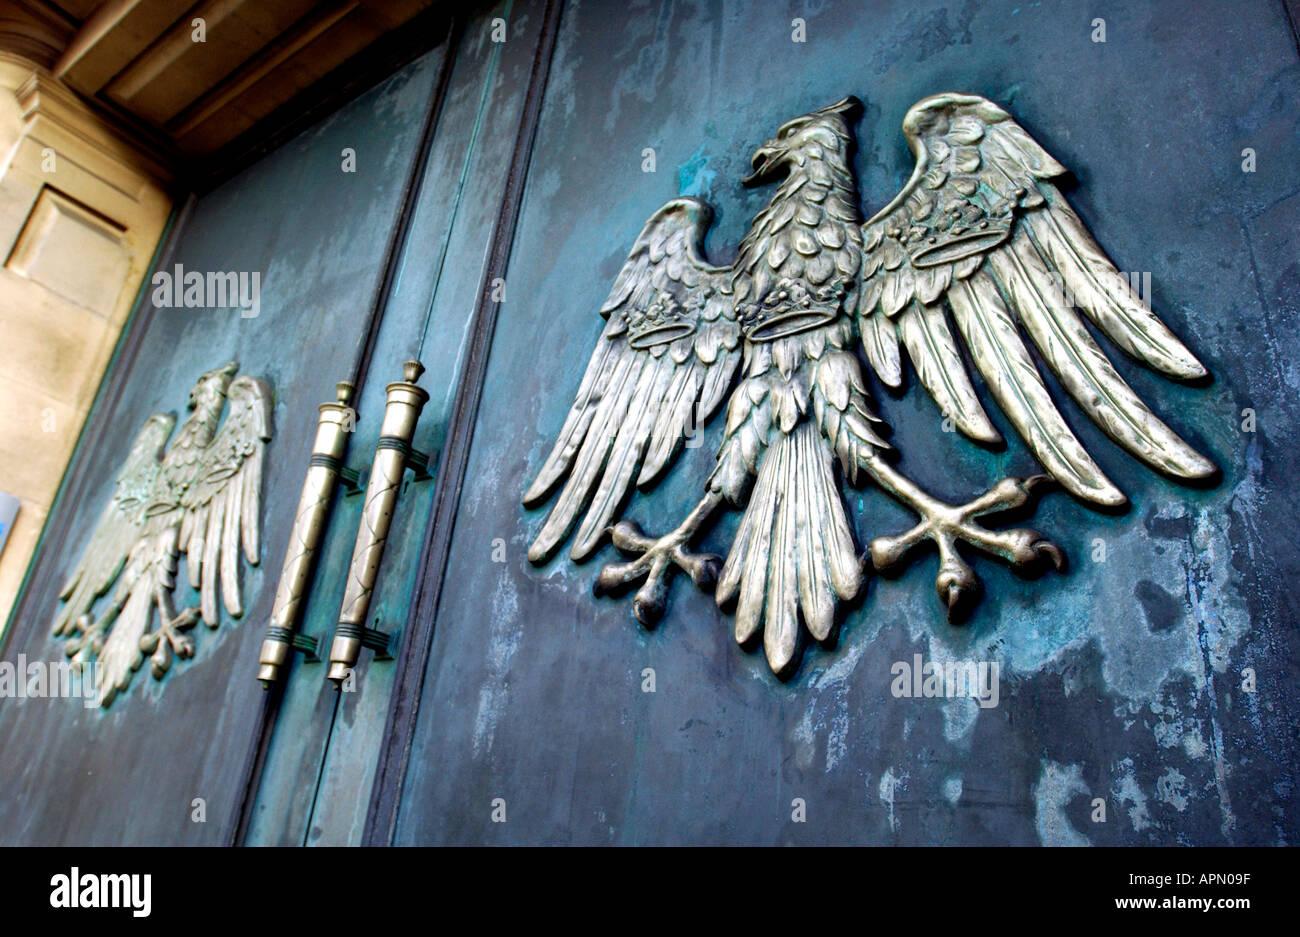 Barclays Bank logo on closed metal doors - Stock Image